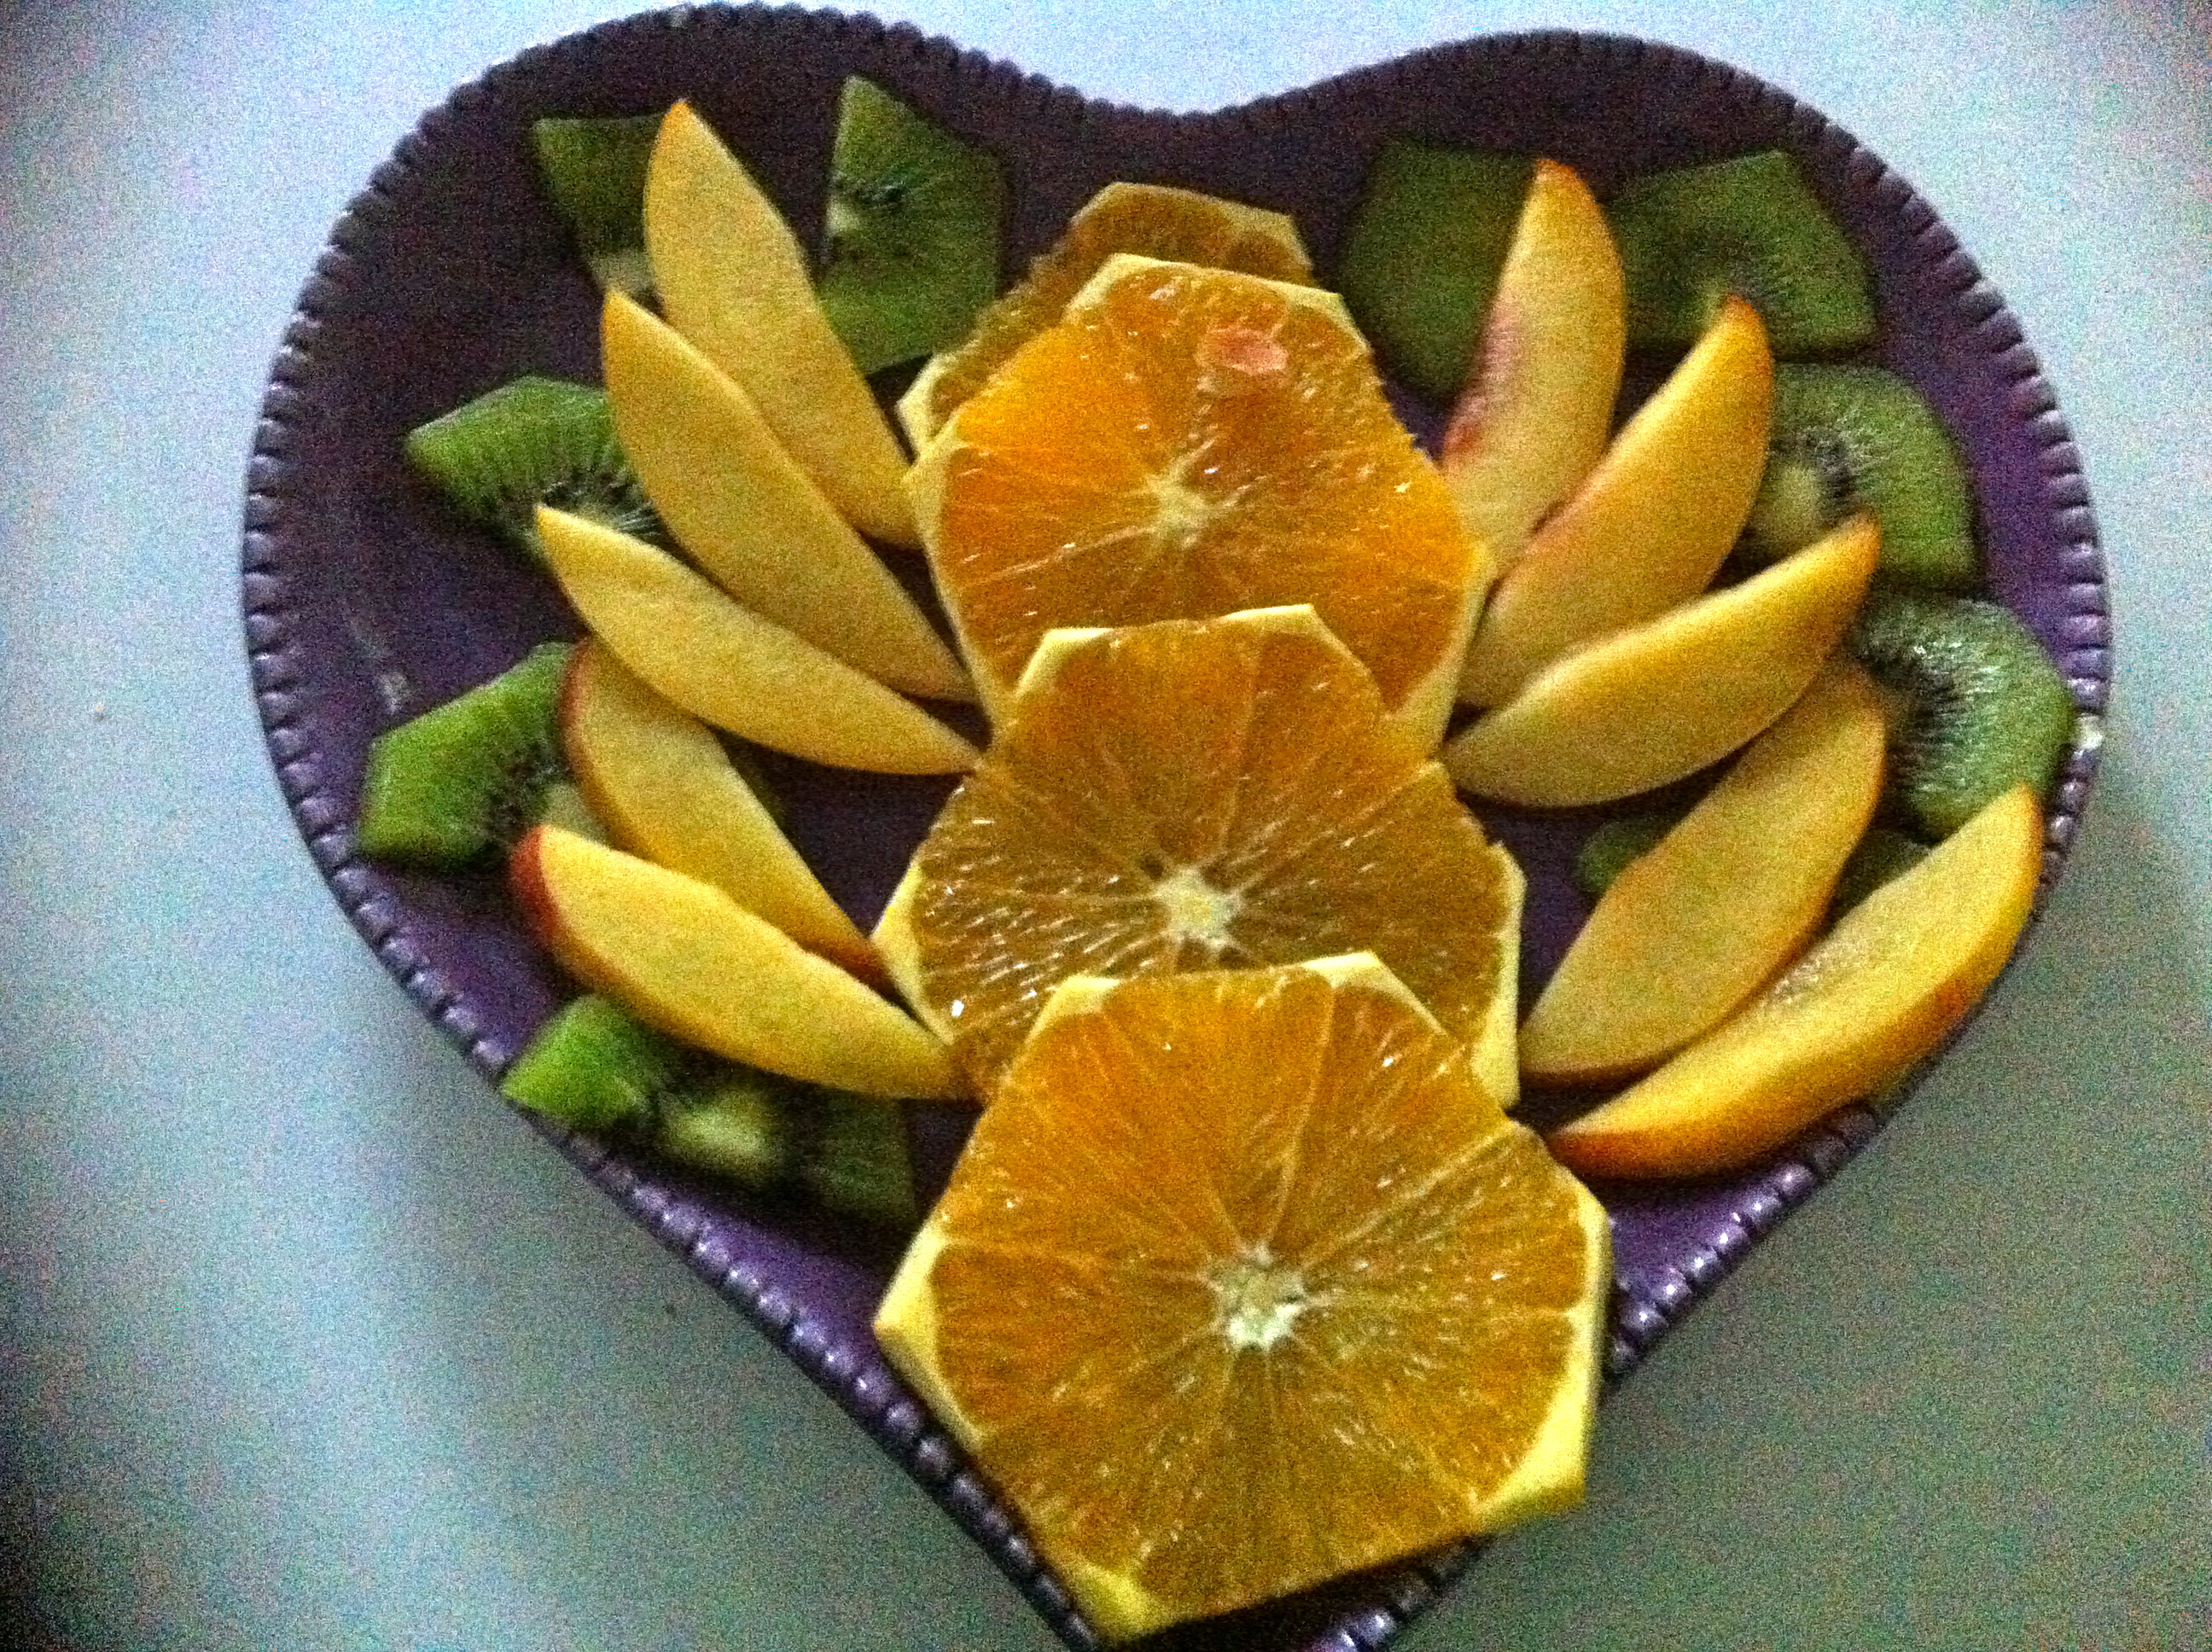 Tomad fruta